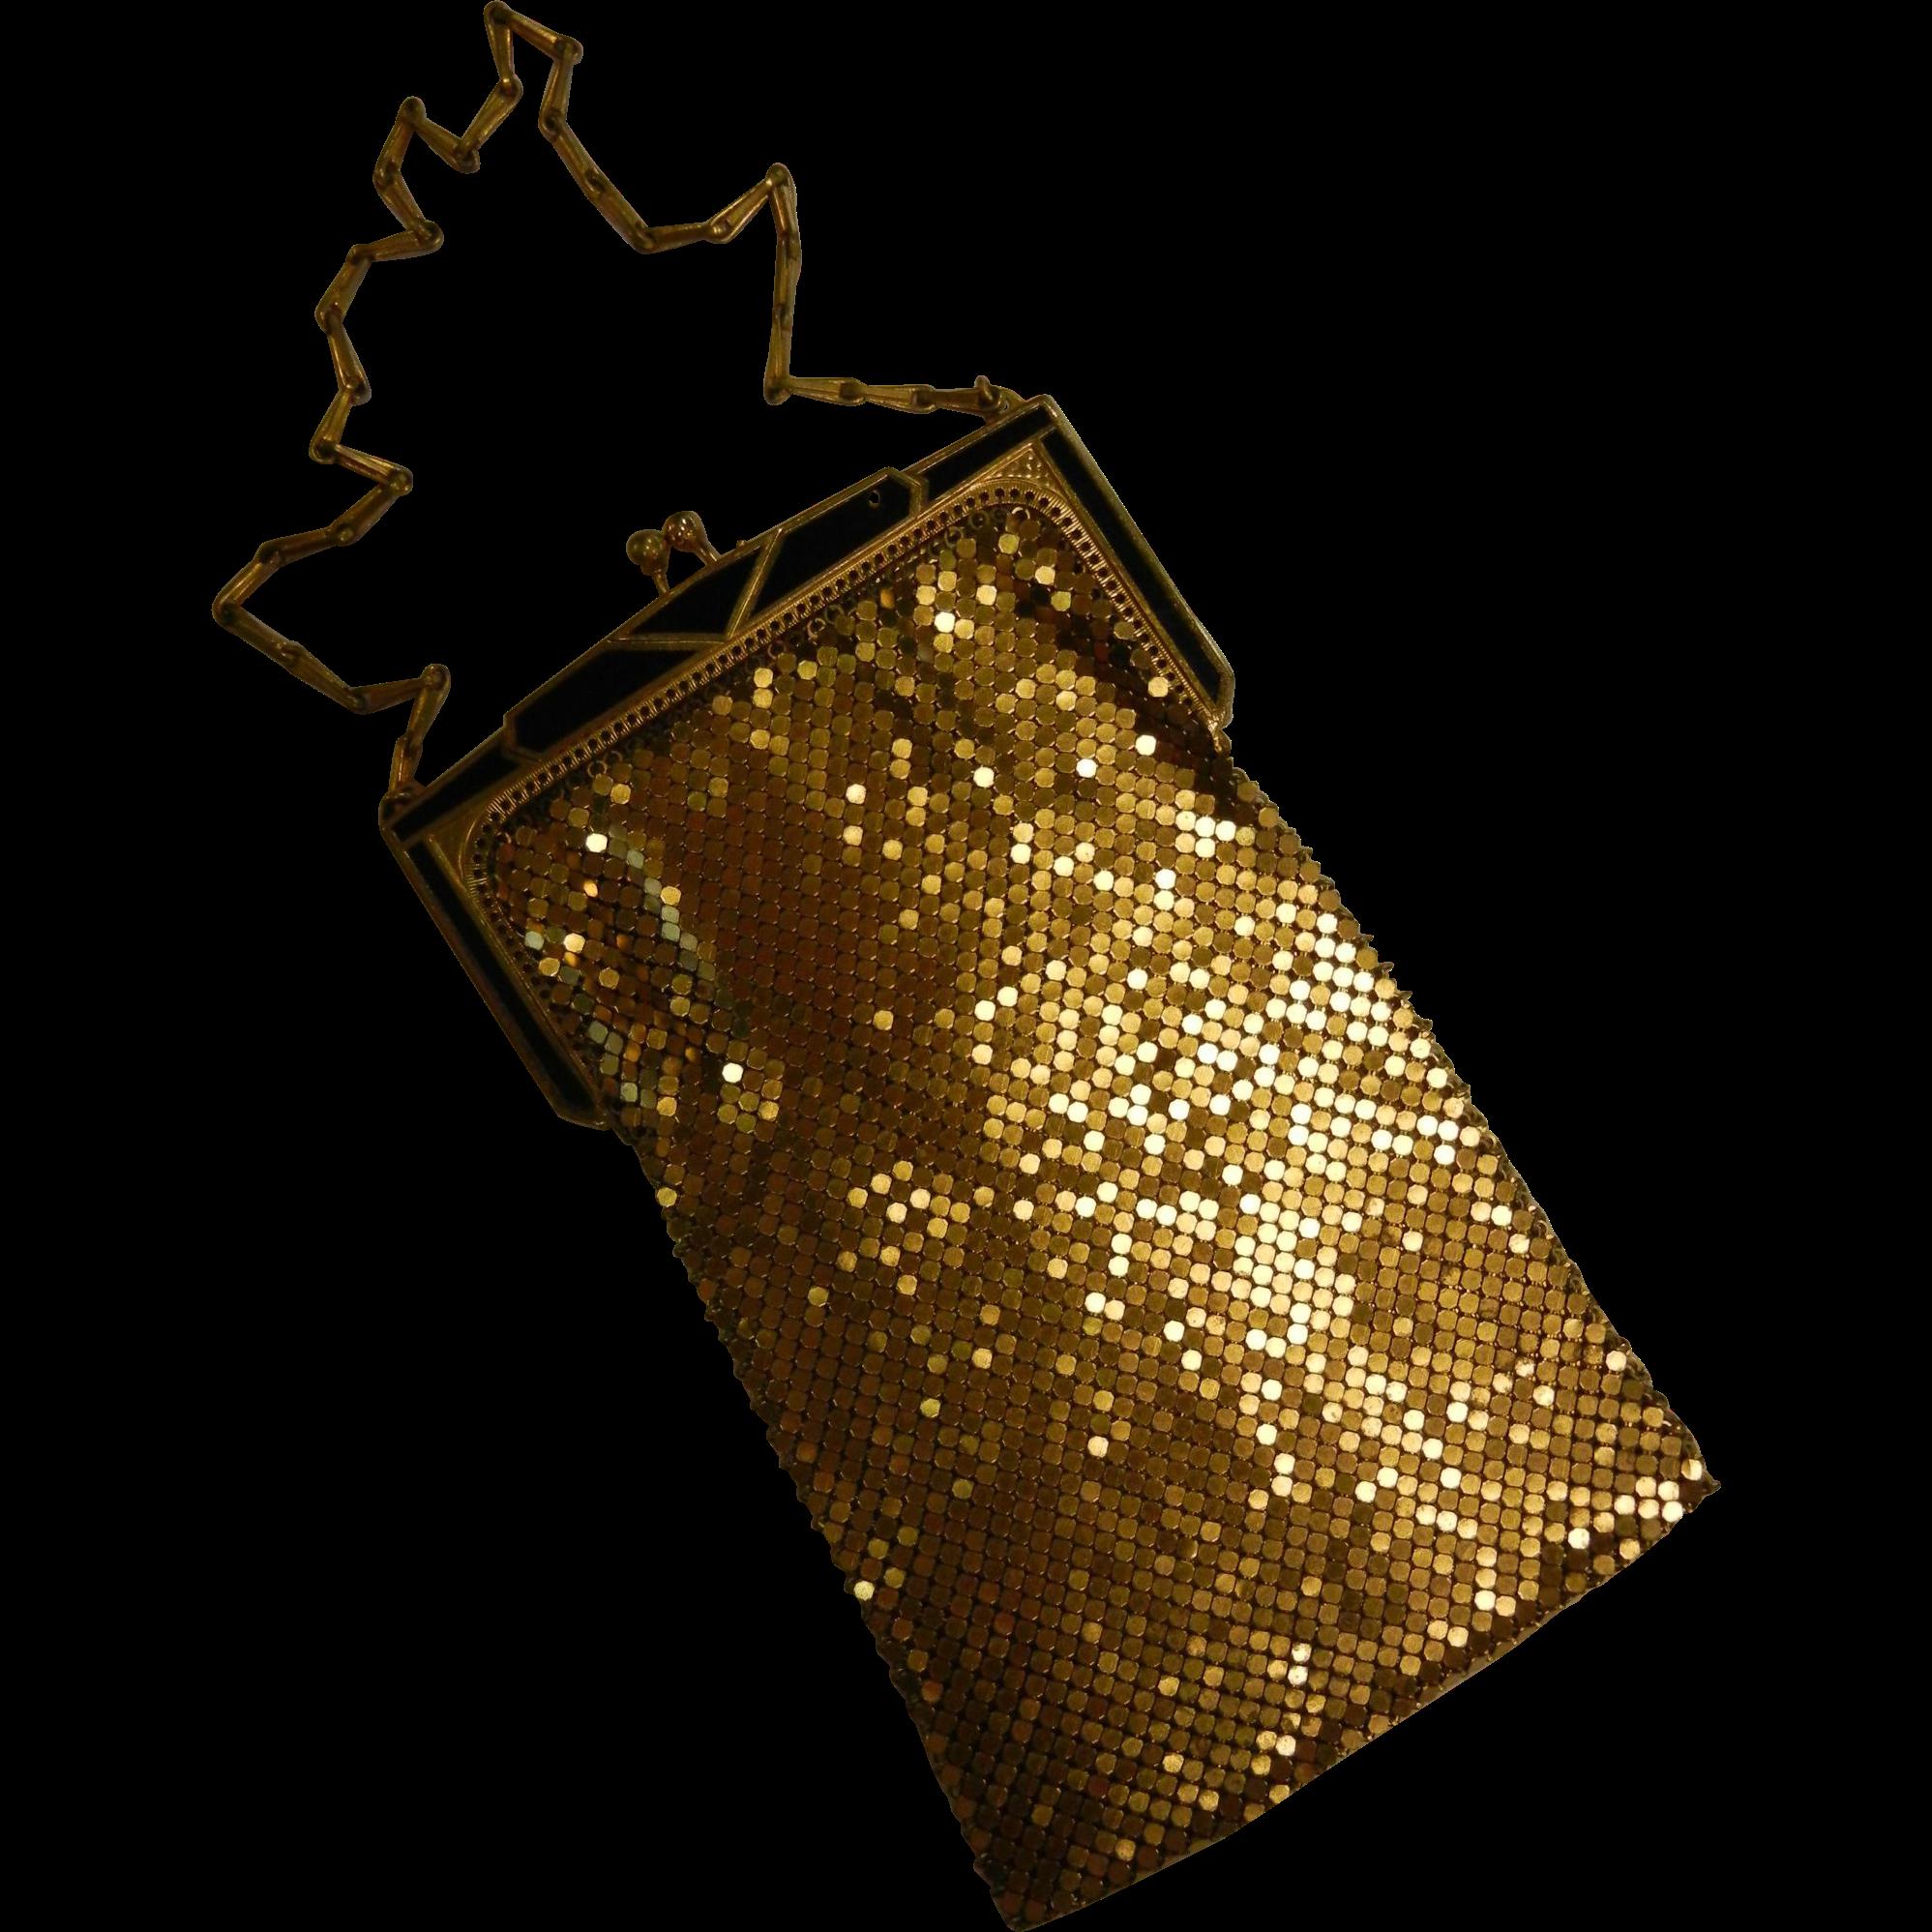 Vintage Whiting & Davis Gold-Tone Mesh Handbag